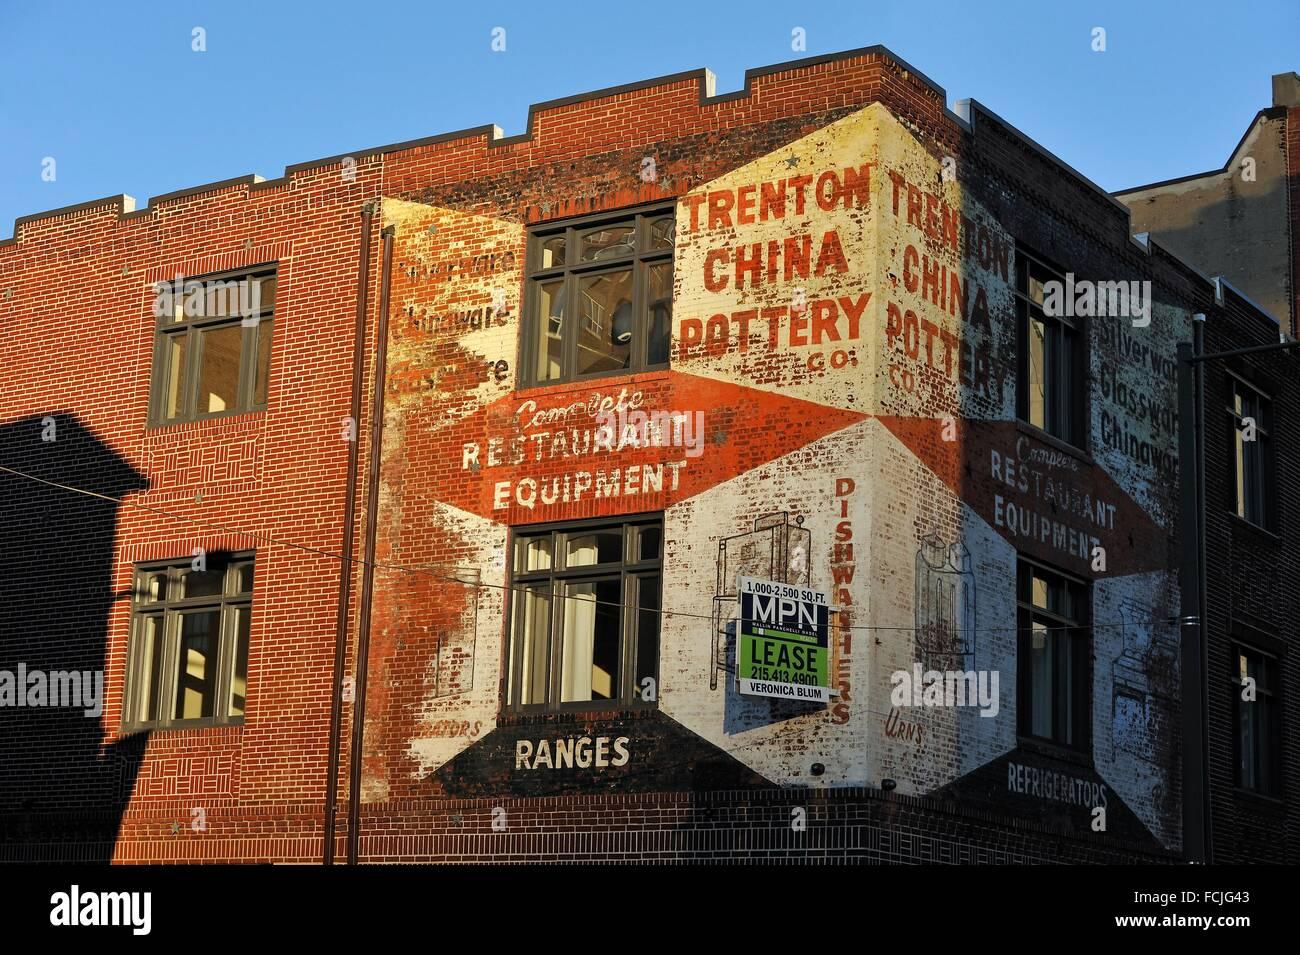 old hand-painted advertising signage, Philadelphia, Commonwealth of Pennsylvania, Northeastern United States,. - Stock Image